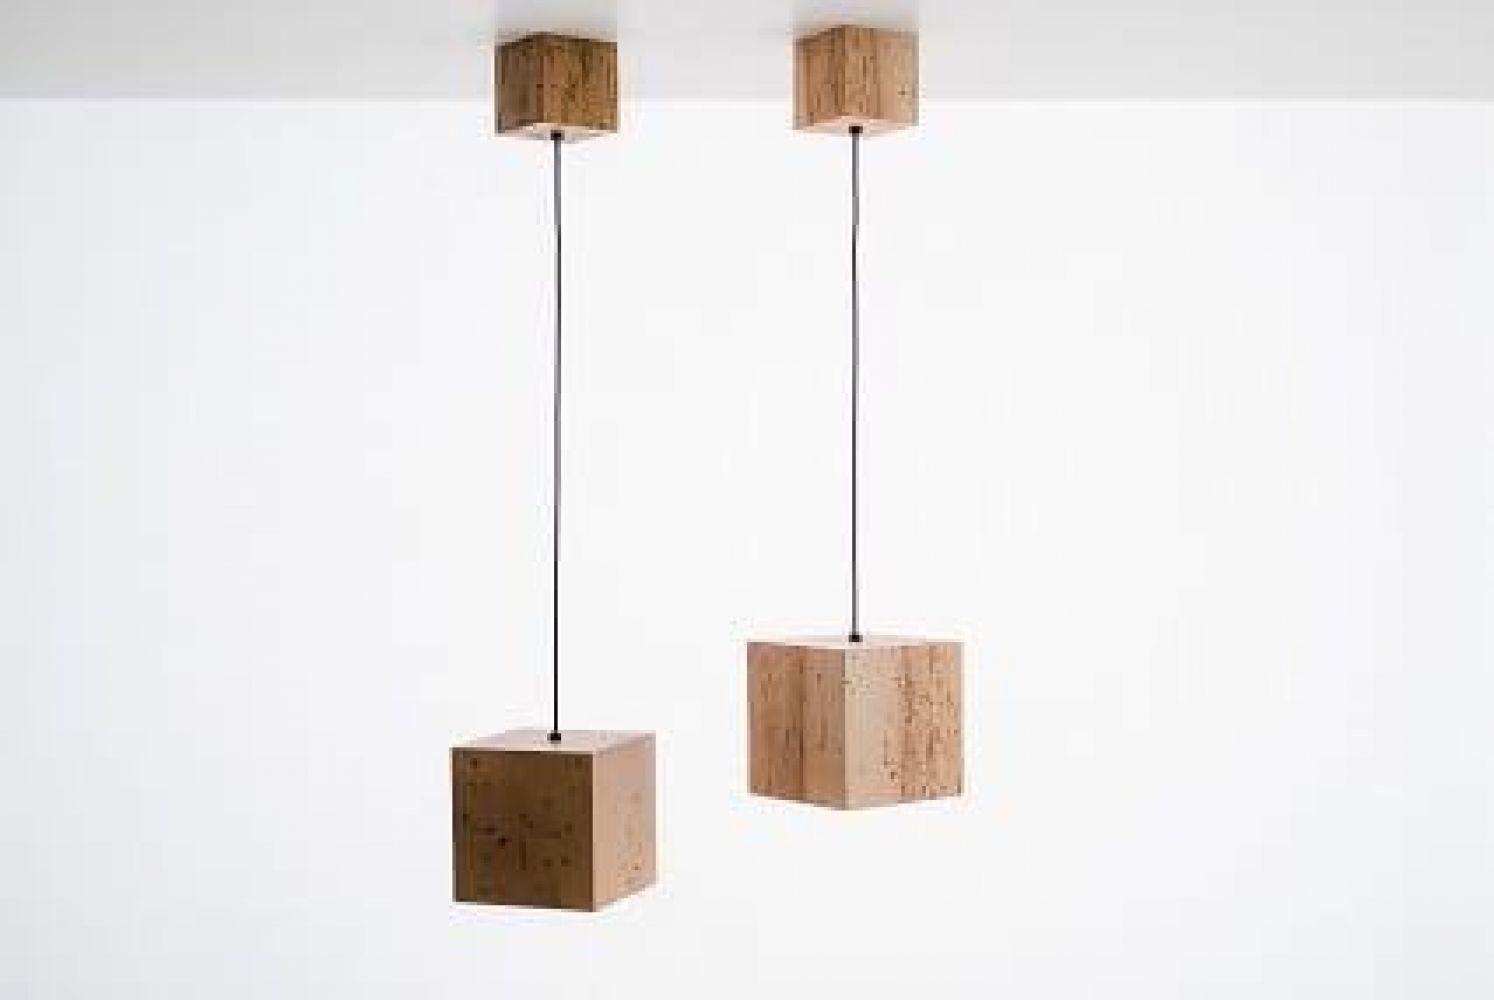 Ecolight Deco 000771